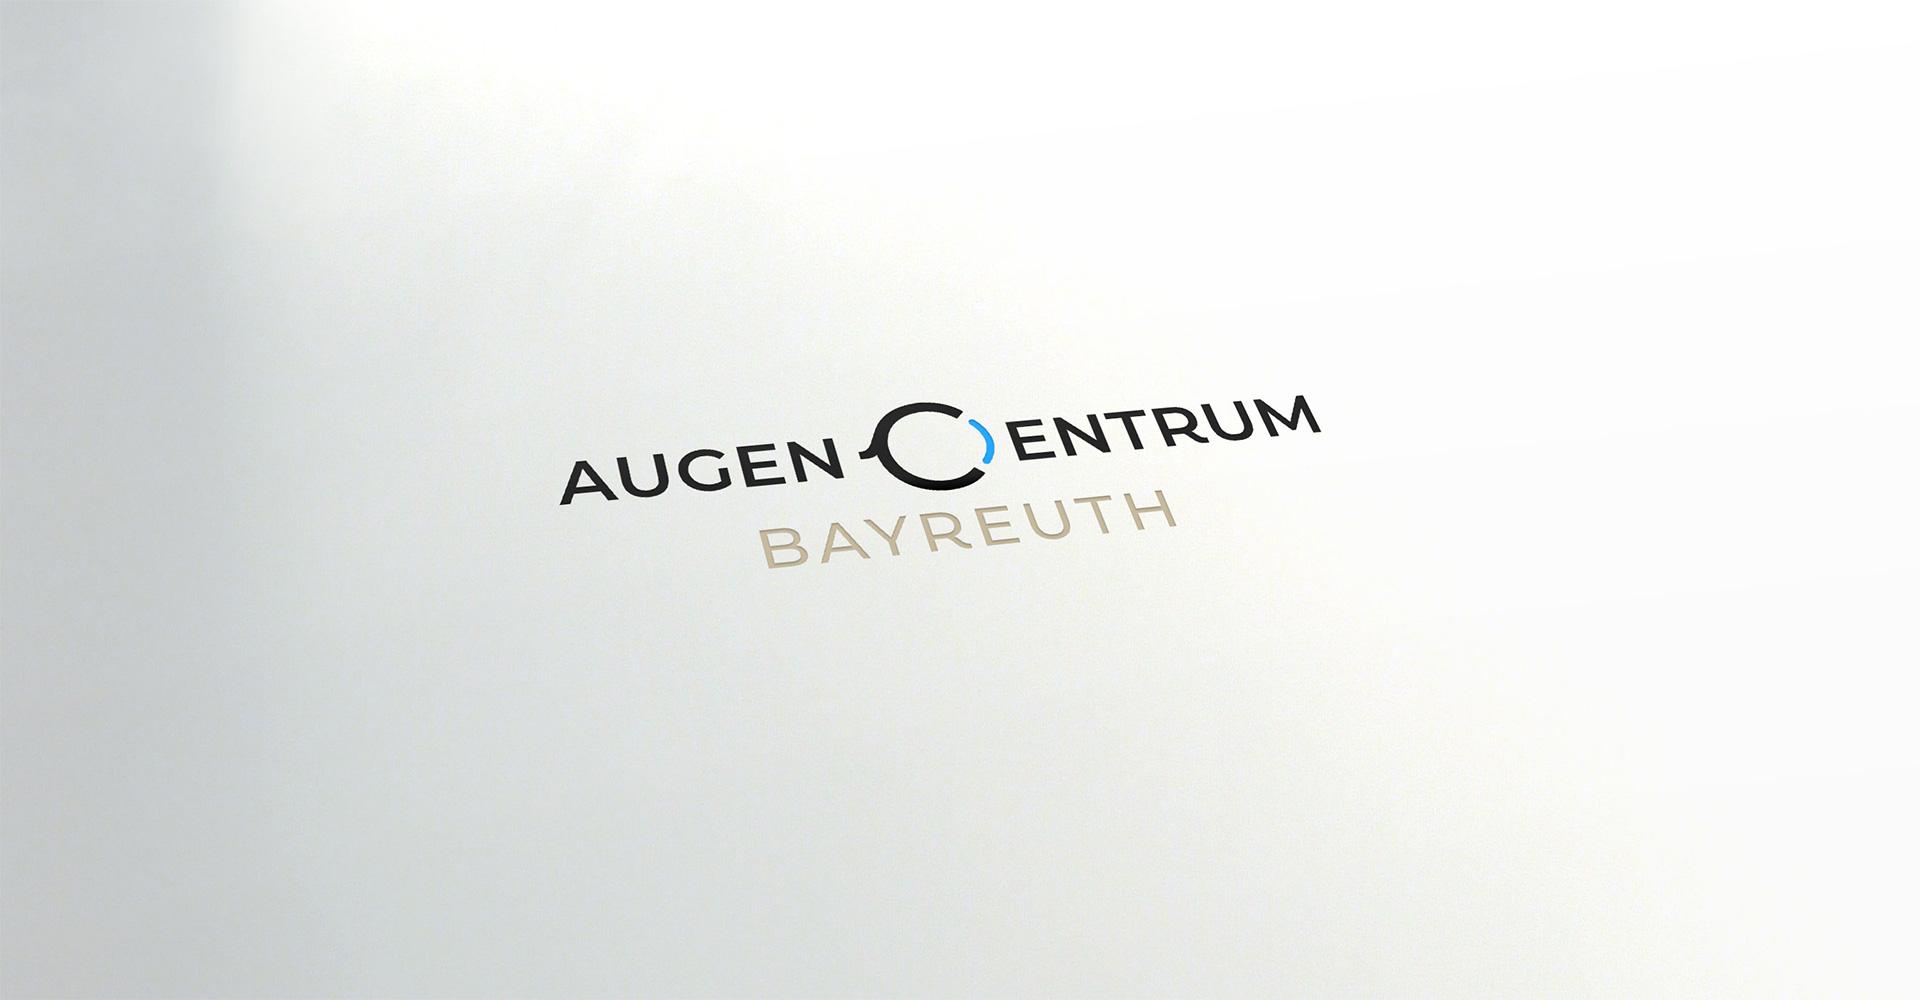 OPUS Marketing / AugenCentrum Bayreuth / Logo